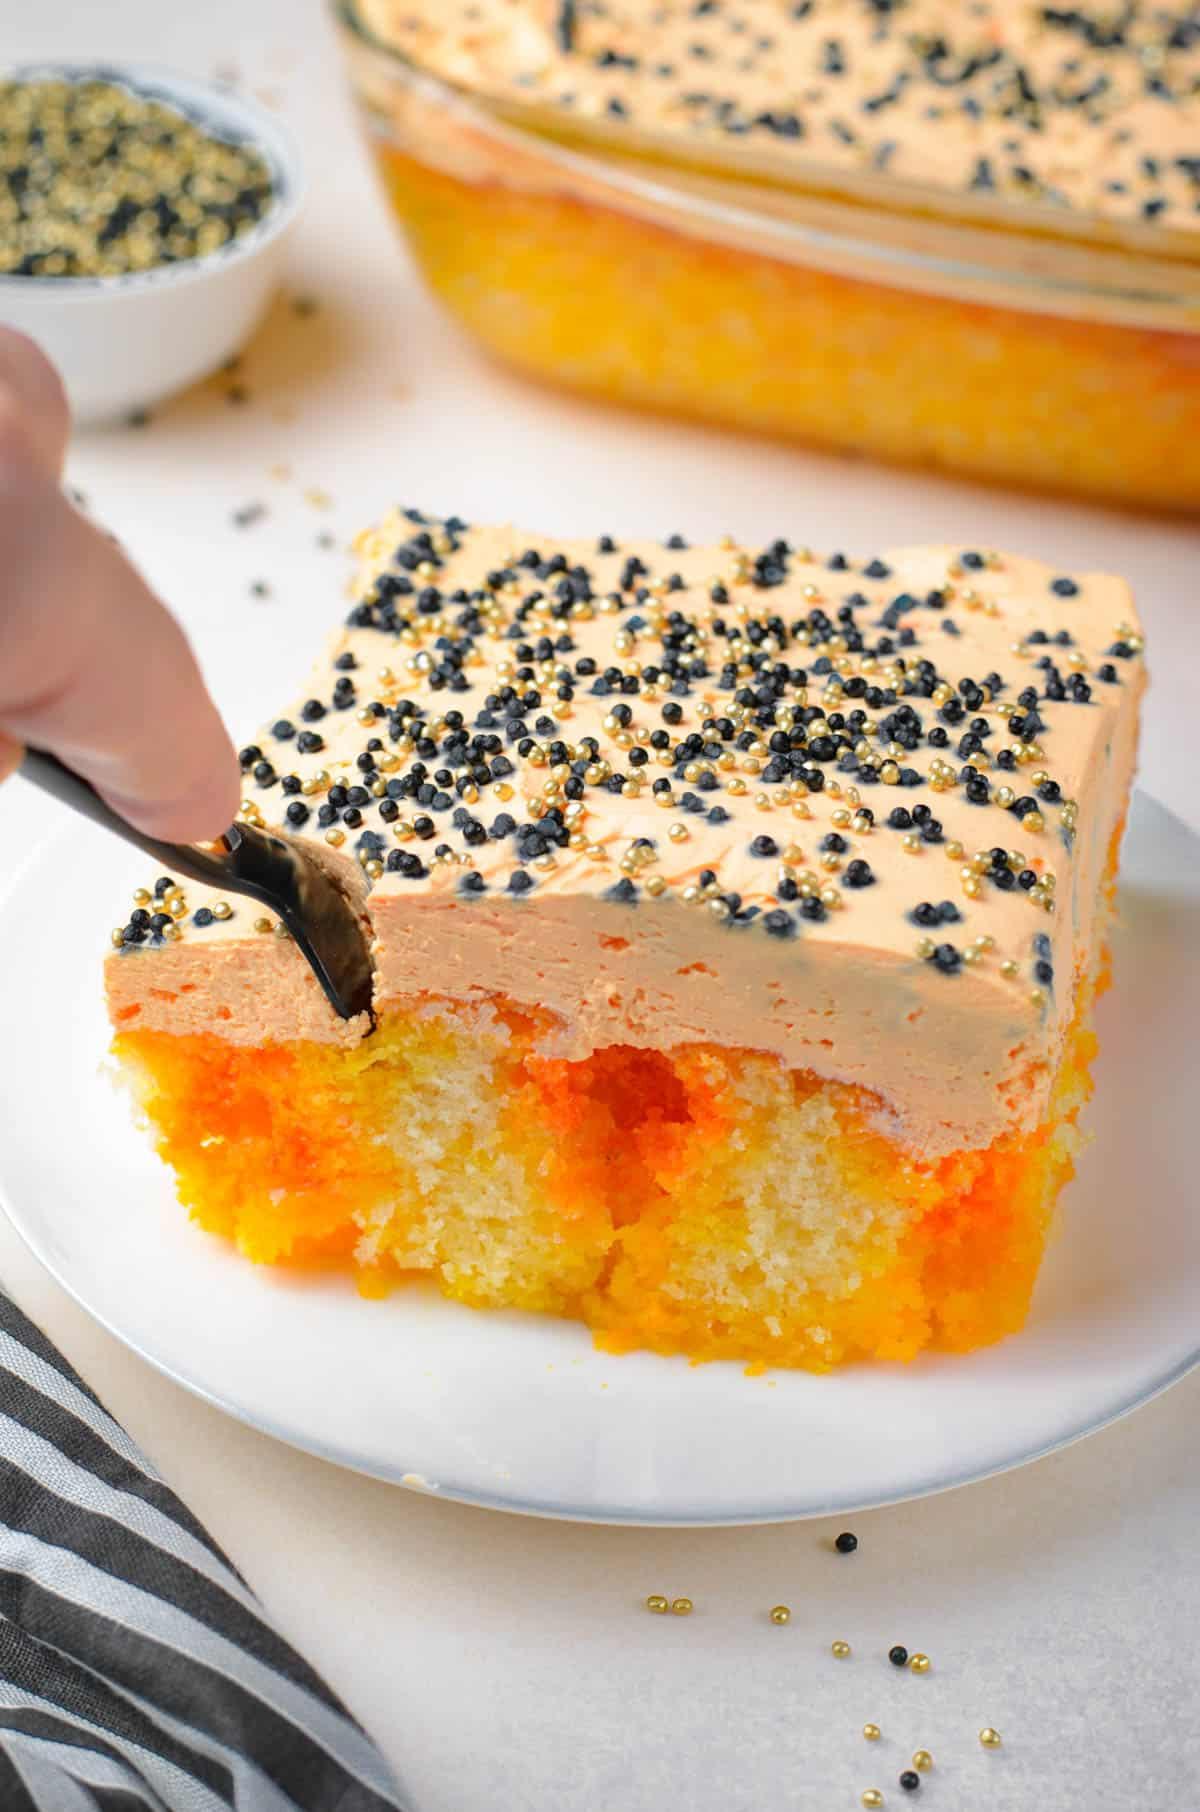 cutting into a piece of orange striped cake